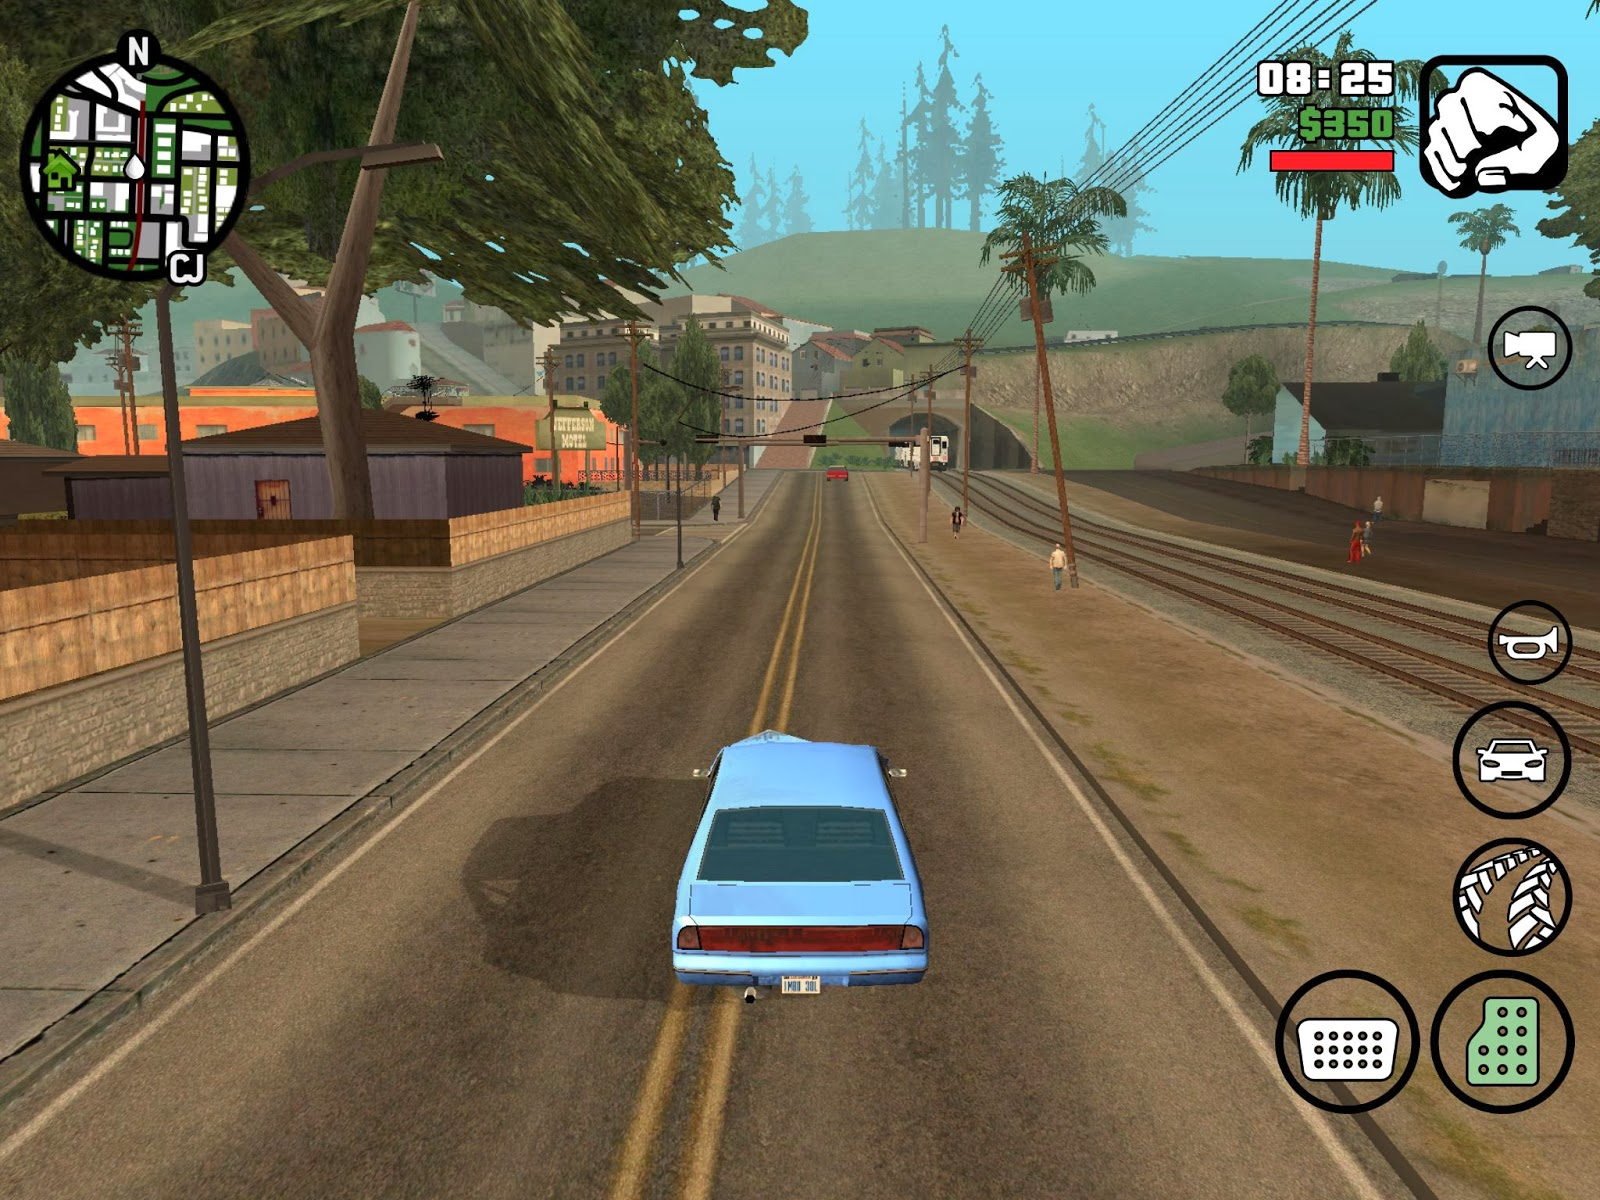 GTA San Andreas for Android (APK + DATA) - SATYANDROID